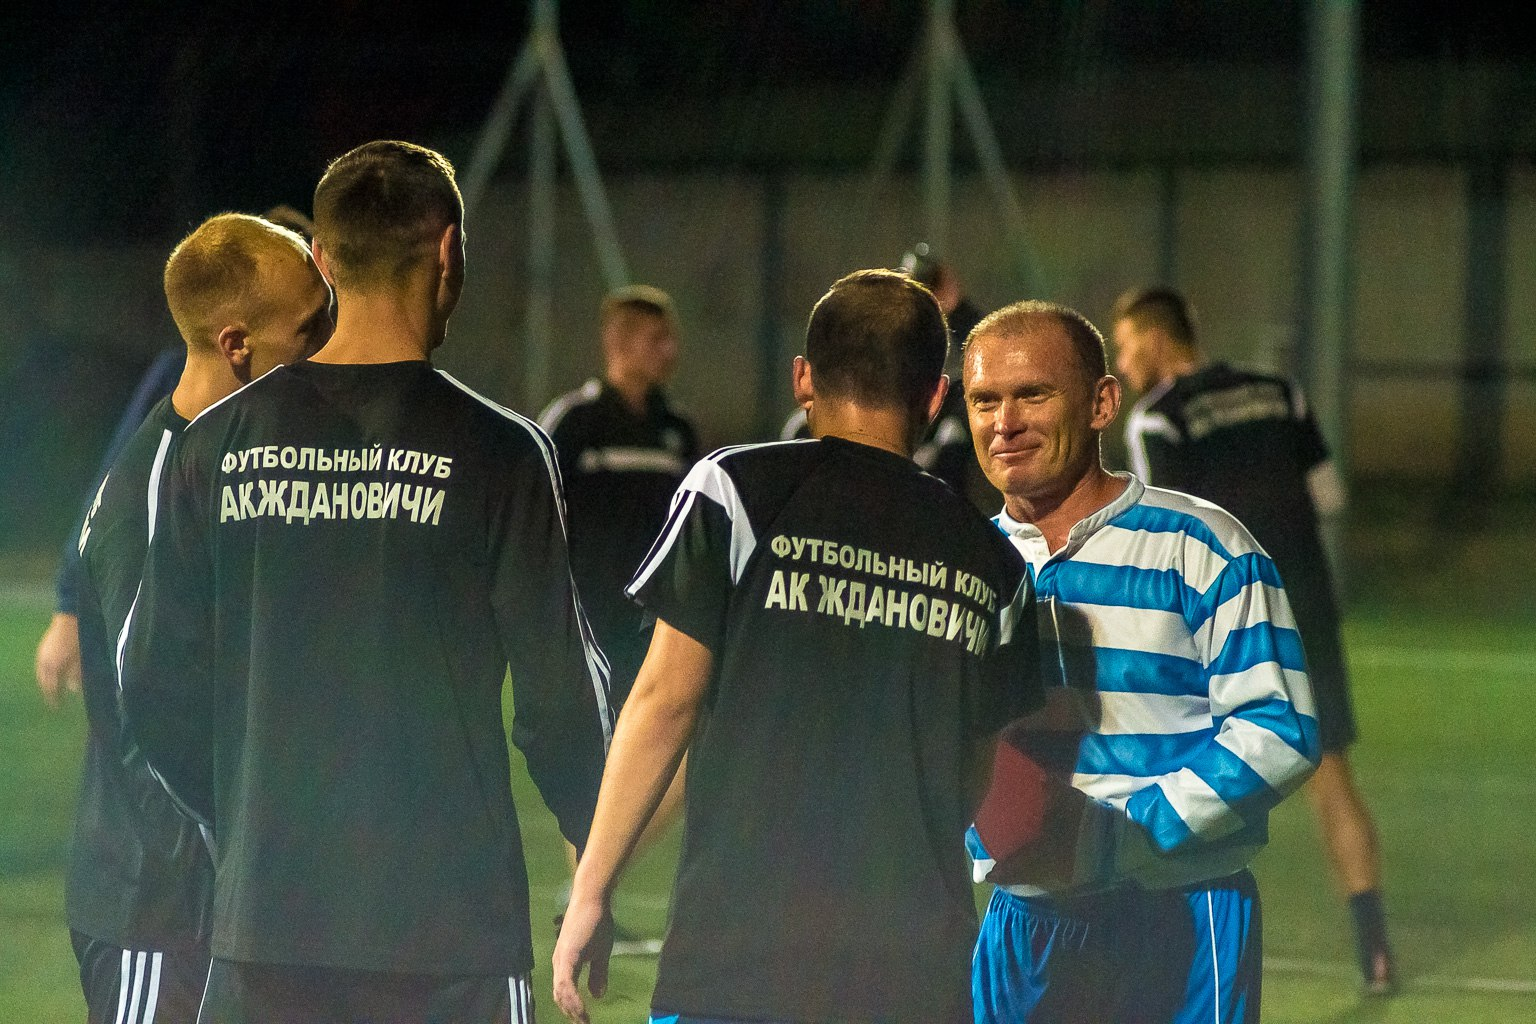 Тренировка ФК АК Ждановичи на Динамо-Юни